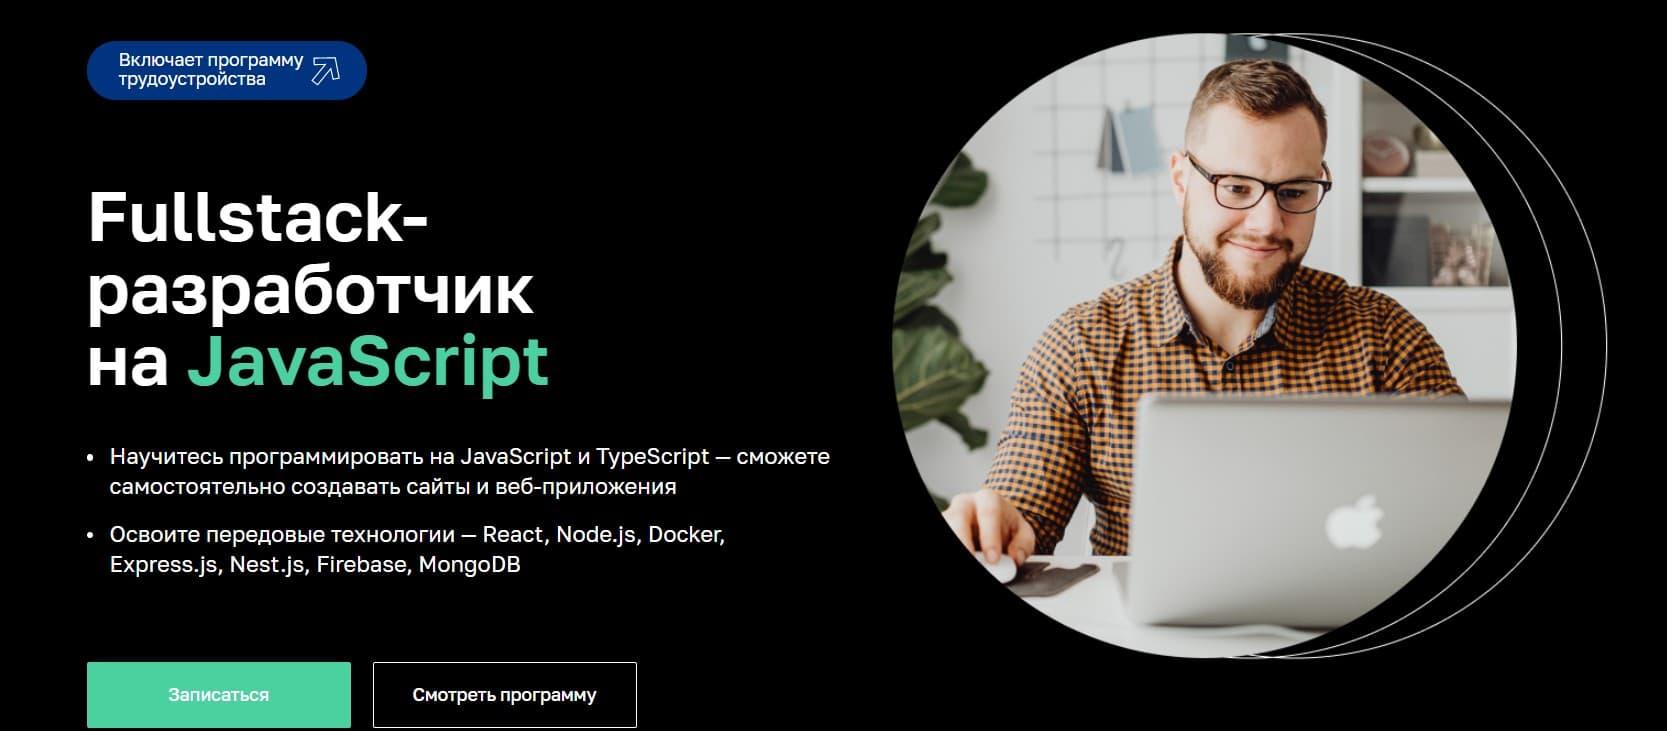 Записаться на курс «Fullstack-разработчик на JavaScript» от Нетологии